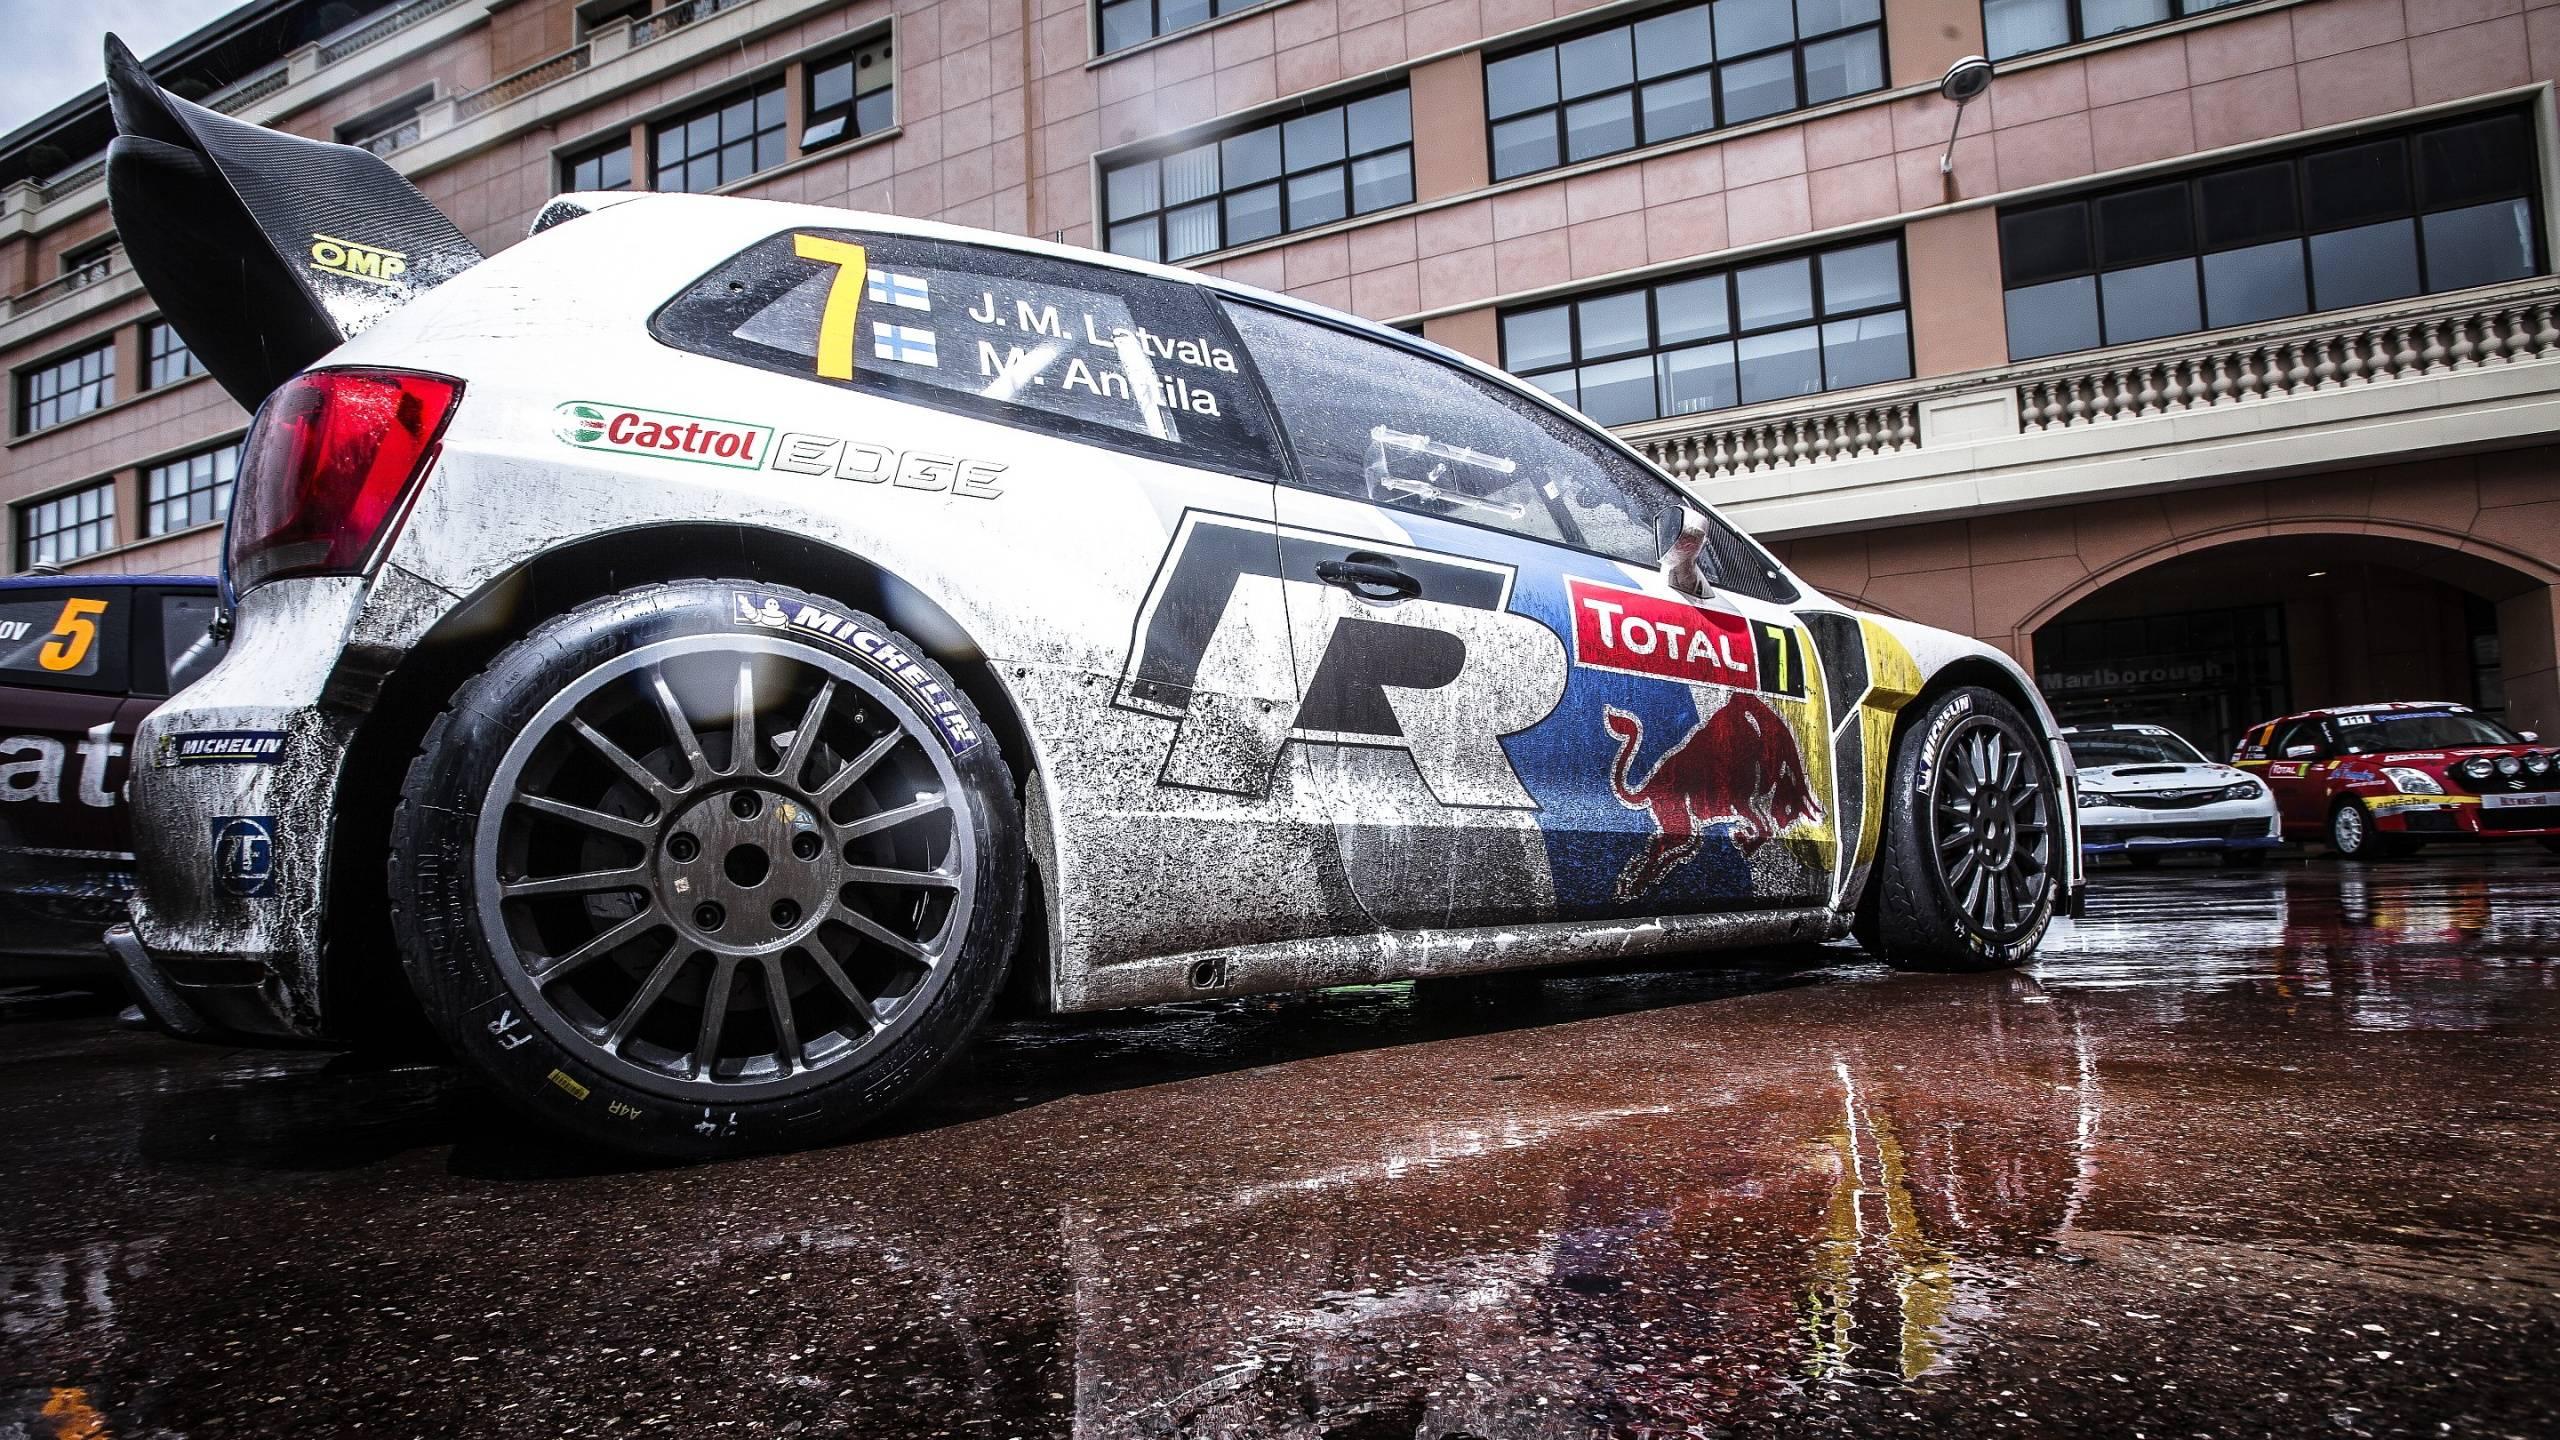 WRC Wallpapers HD - Wallpaper Cave Race 2 Wallpapers Hd